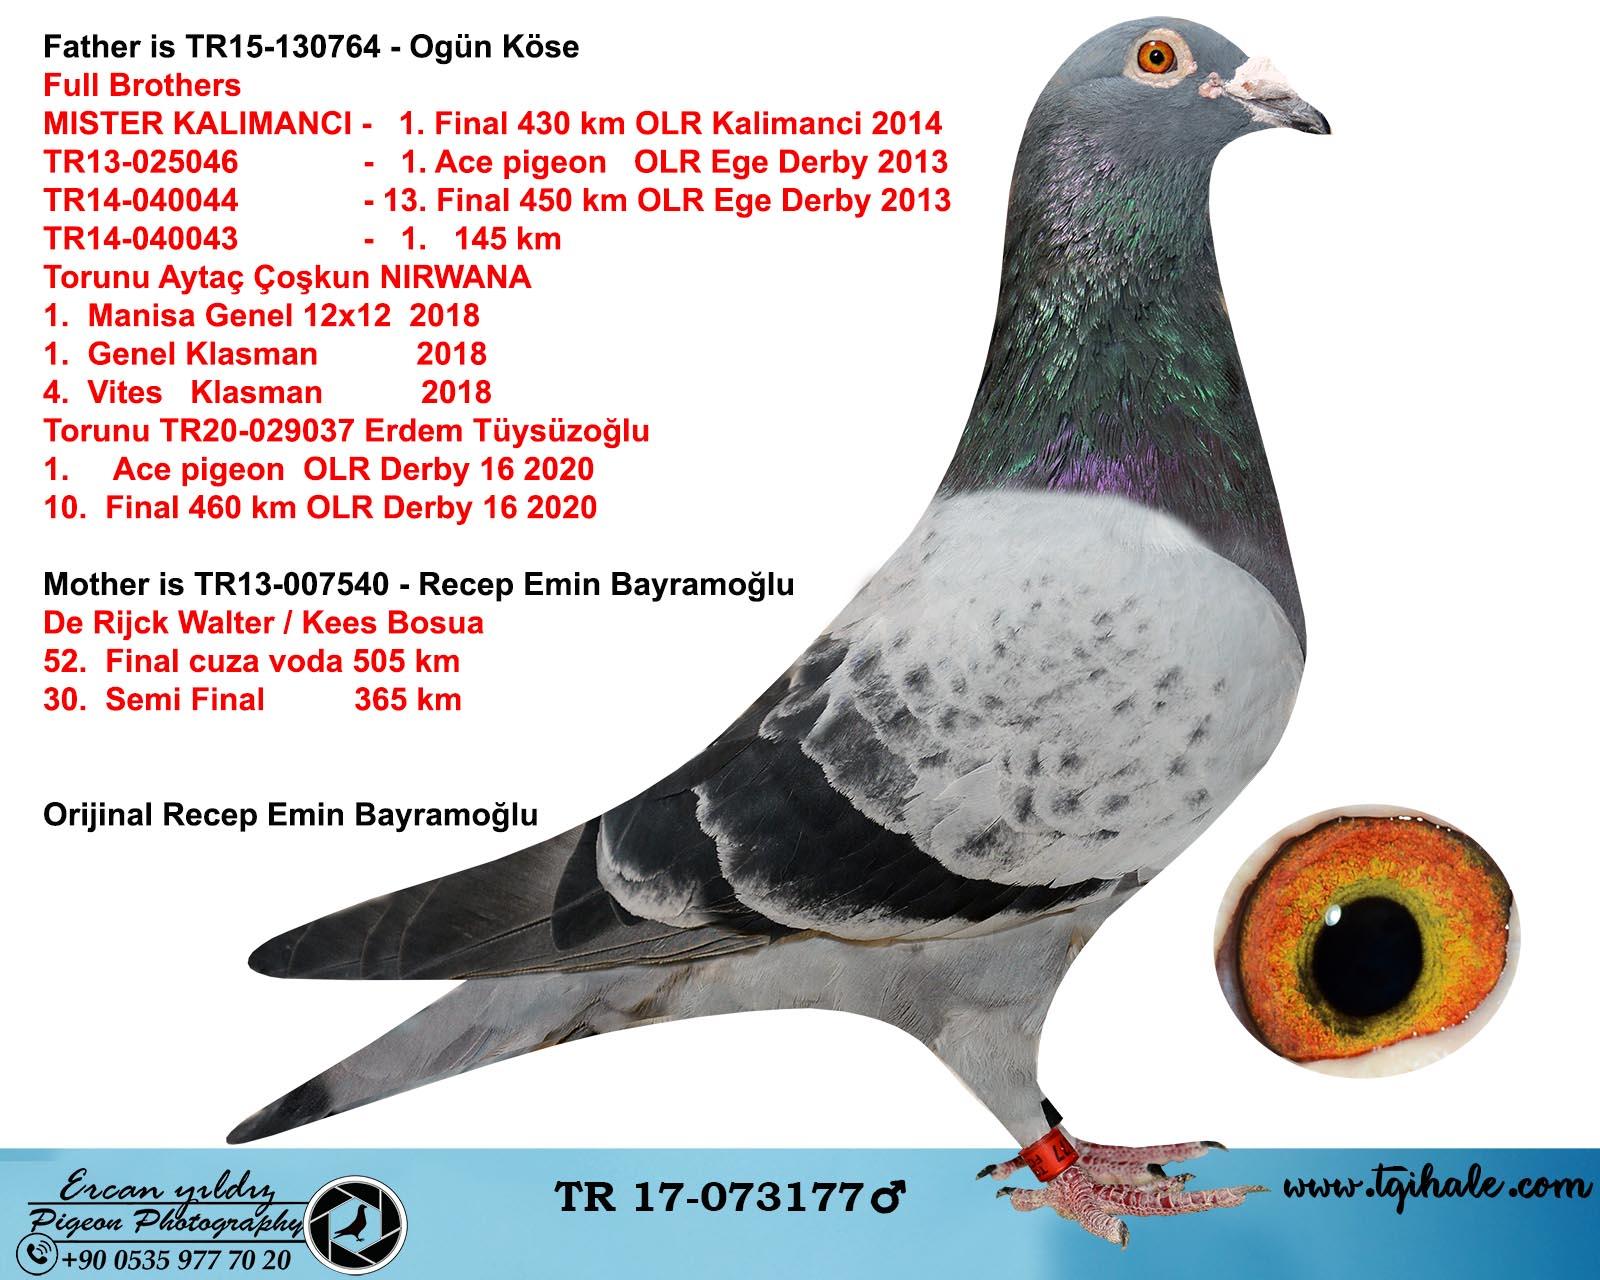 TR17-073177 ERKEK / BABASI BROTHER MISTER KALIMANCİ ANNESİ R. WALTER - K. BOSUA